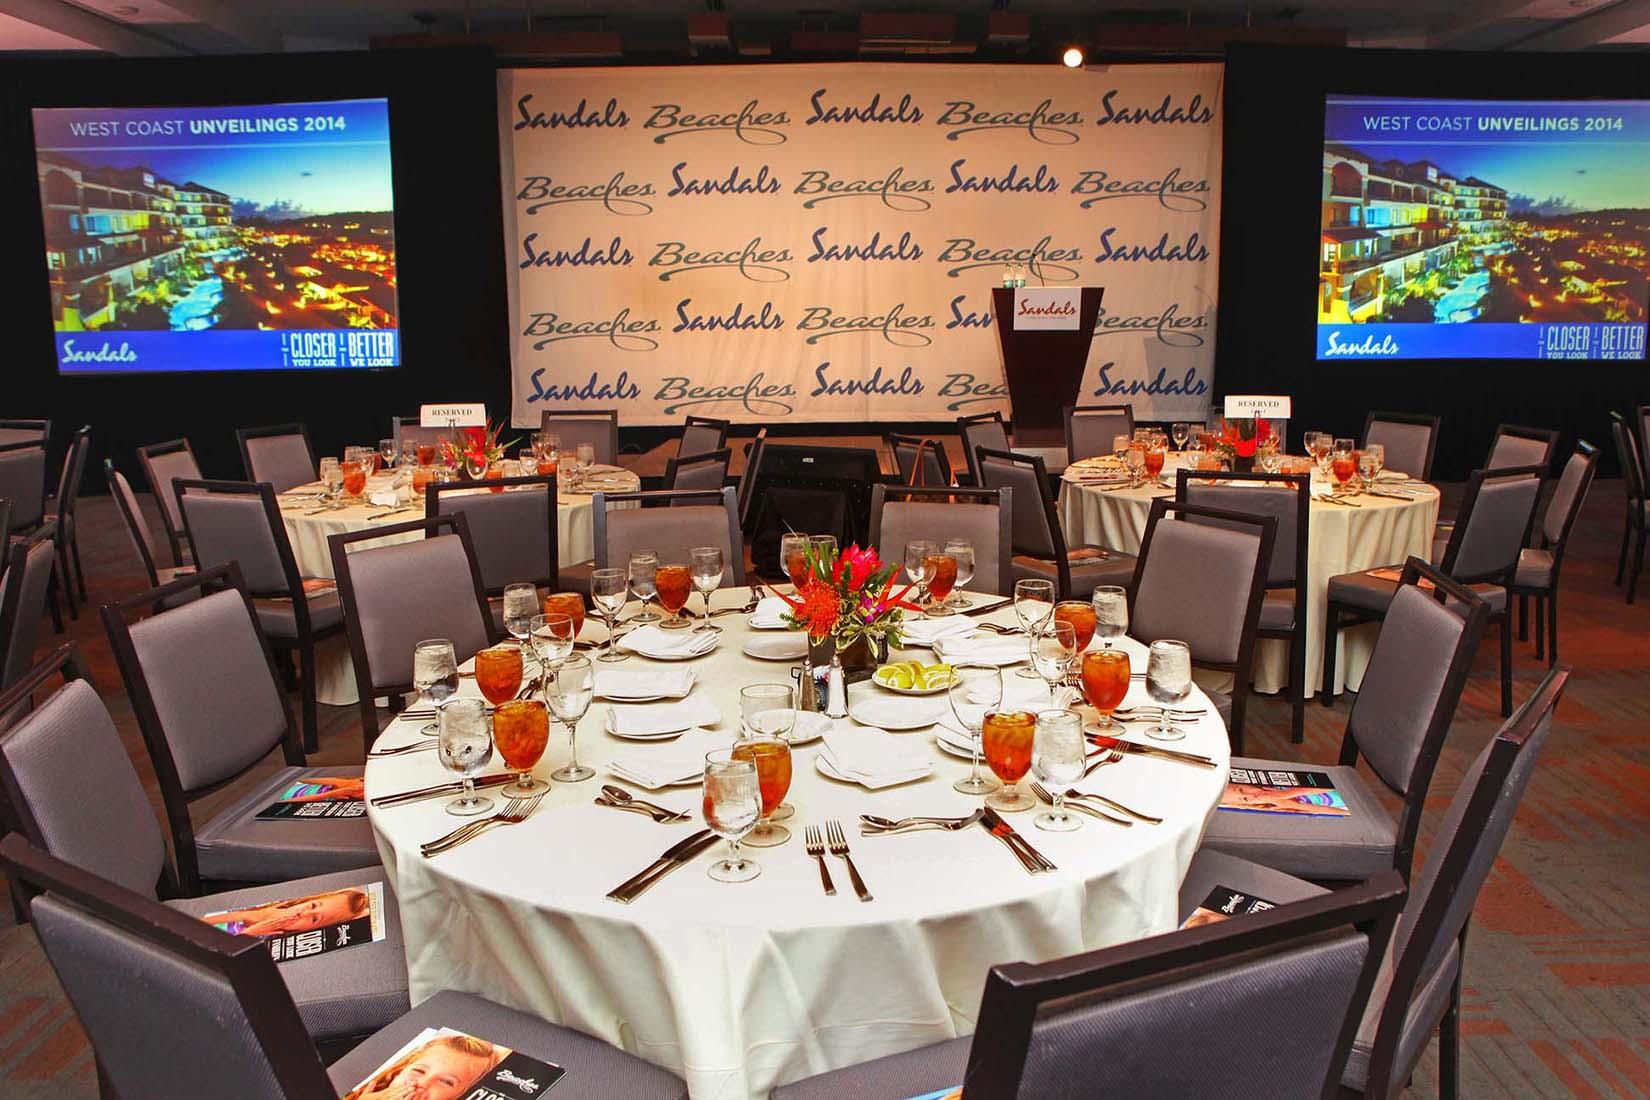 parc 55 hotel banquet room set up